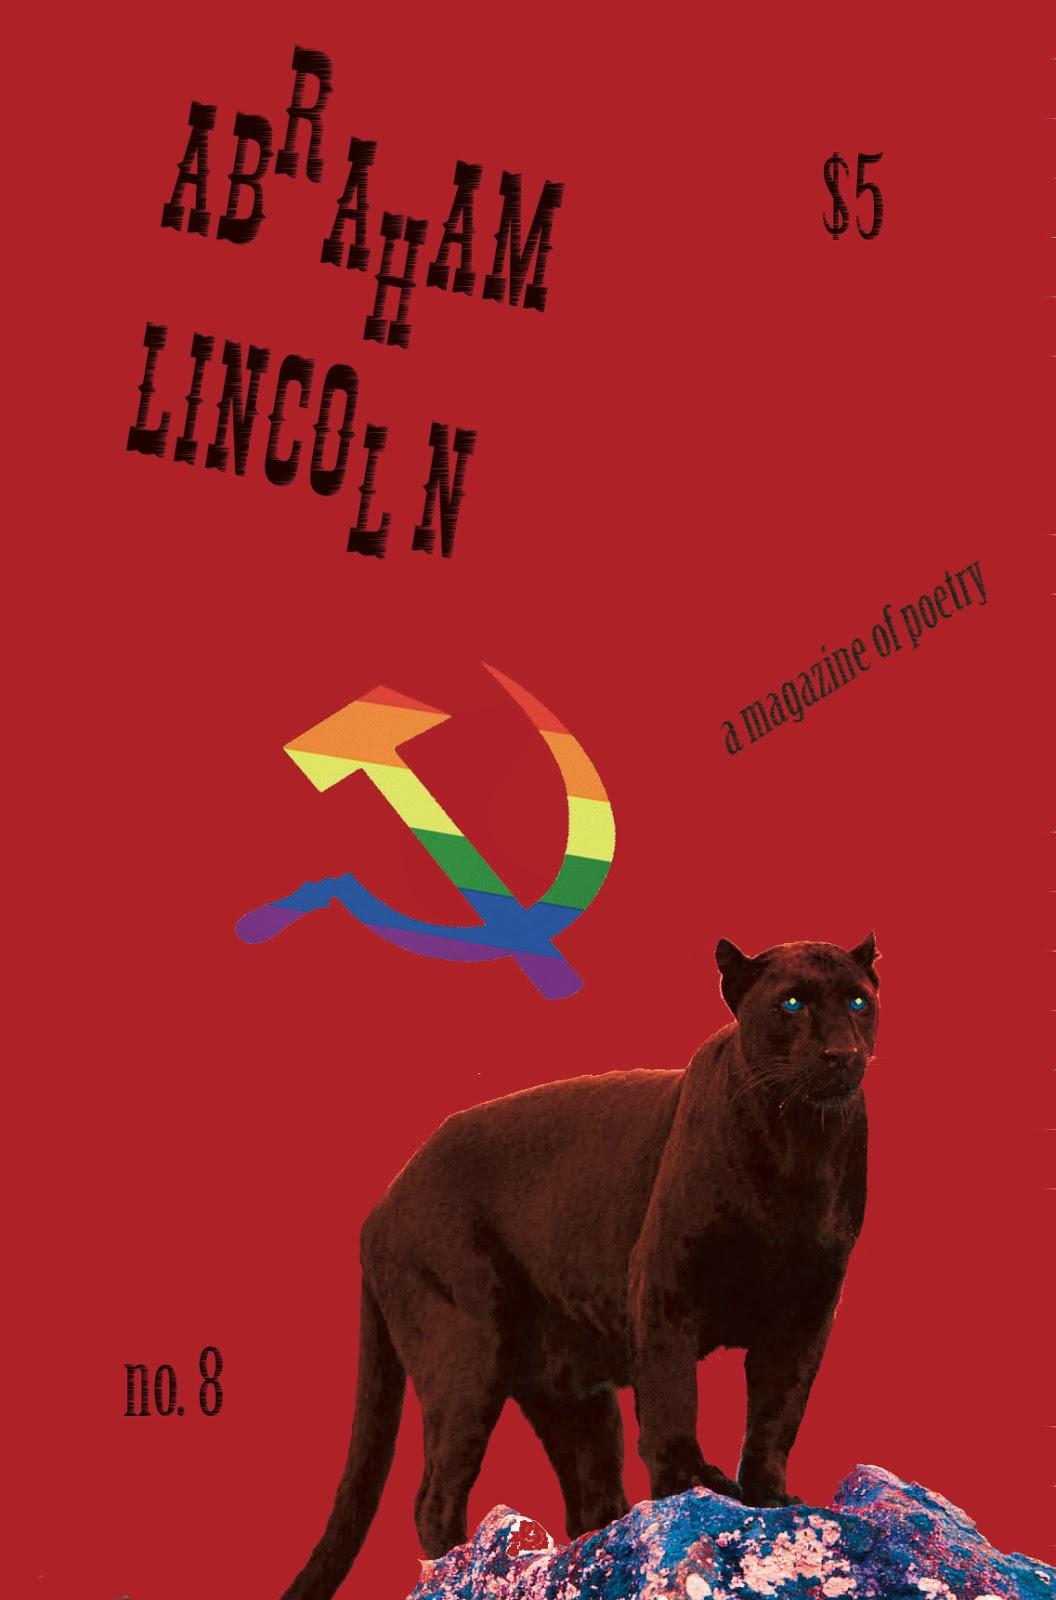 Lincoln monica dick picture abraham